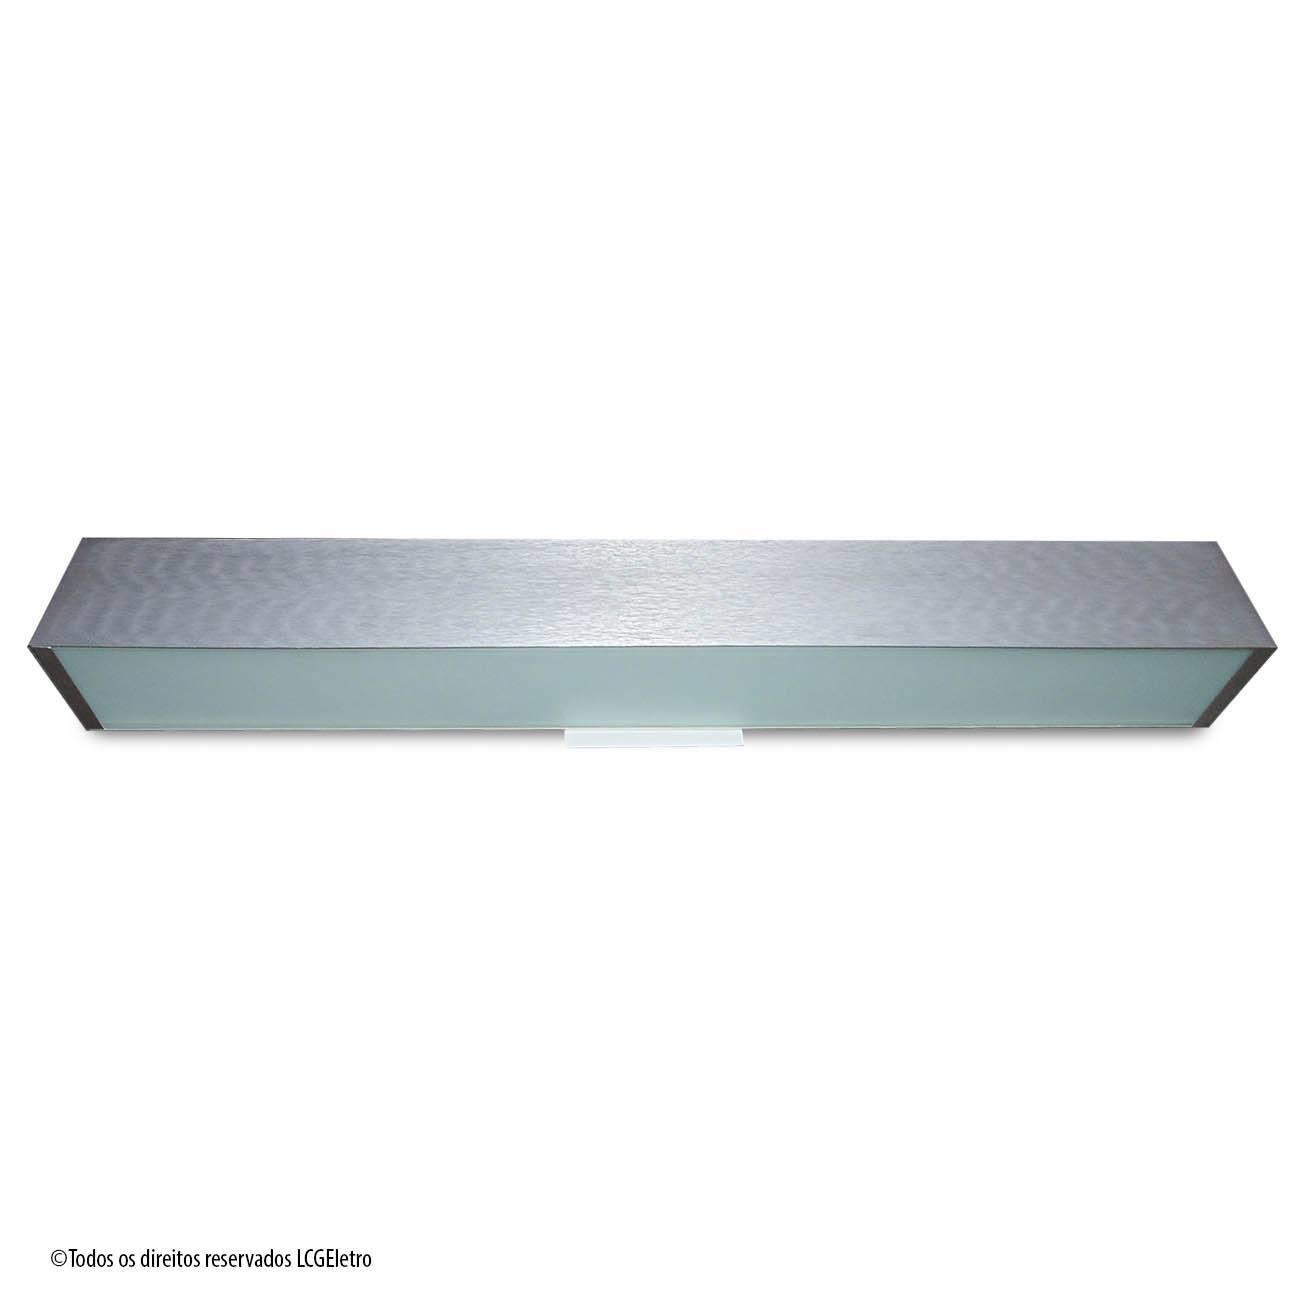 Arandela Clássica Alumínio Banheiro Lavabo TS5024 Bella - LCGELETRO